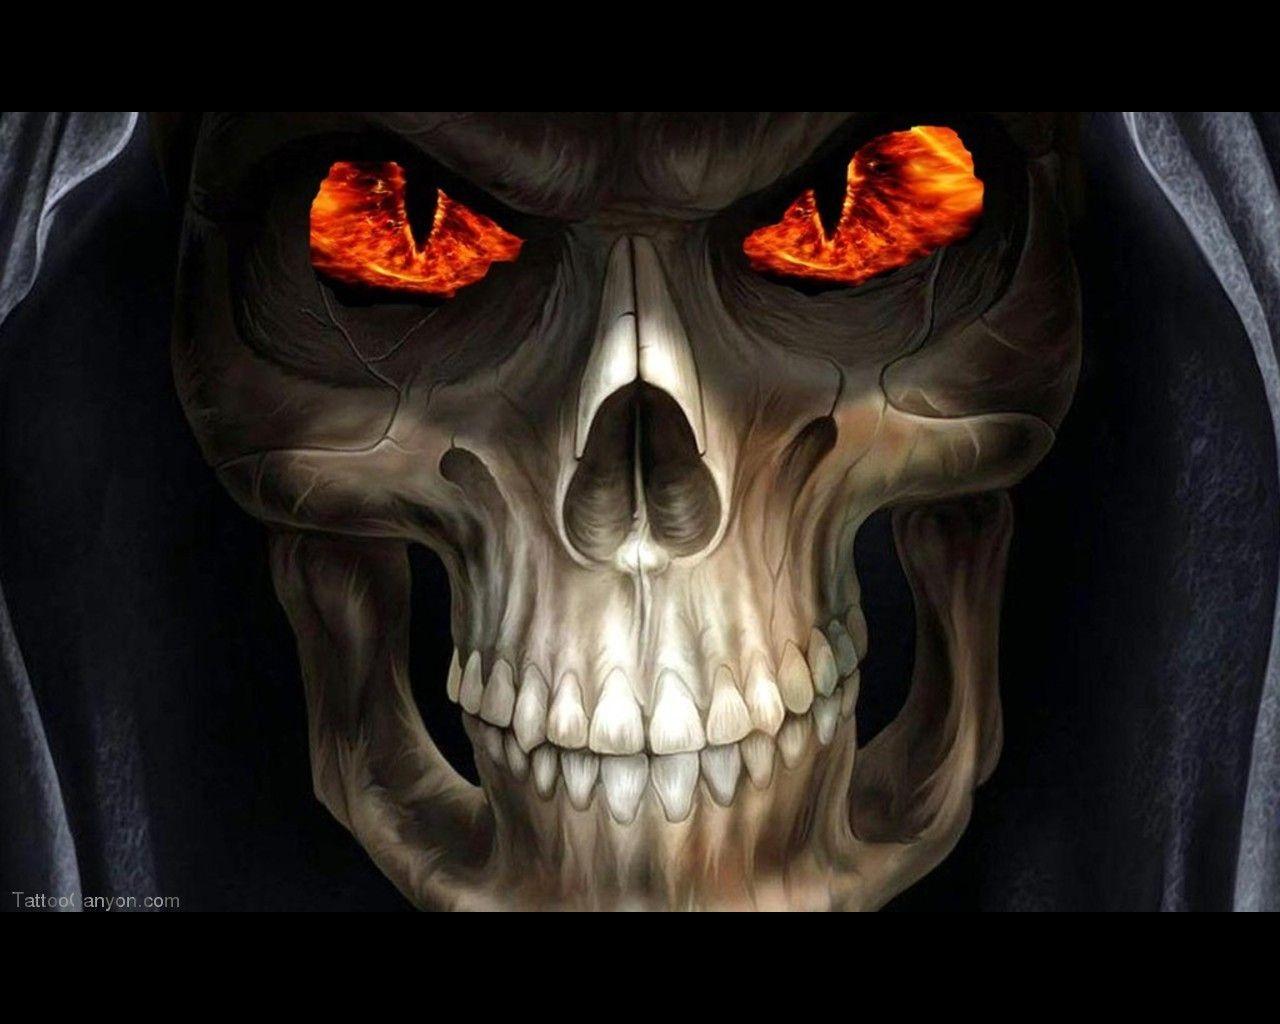 Grim Reaper Skull Tattoos Grim Reaper Horror Skull Wallpaper Free Download Tattoo 32843 Picture Skull Wallpaper Skull Pictures Horror Skull